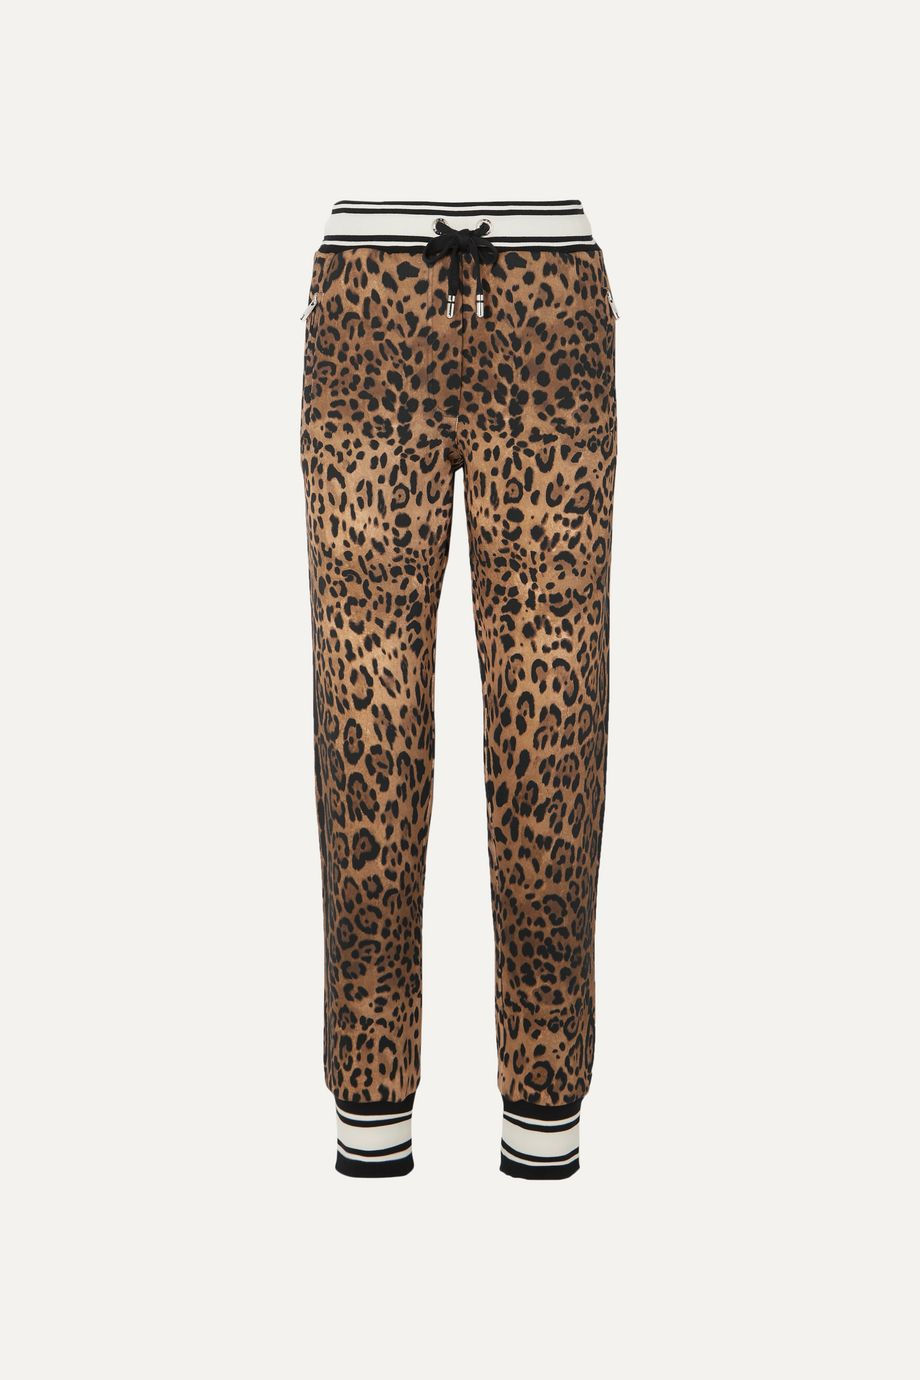 Dolce & Gabbana Leopard-print cotton-jersey track pants